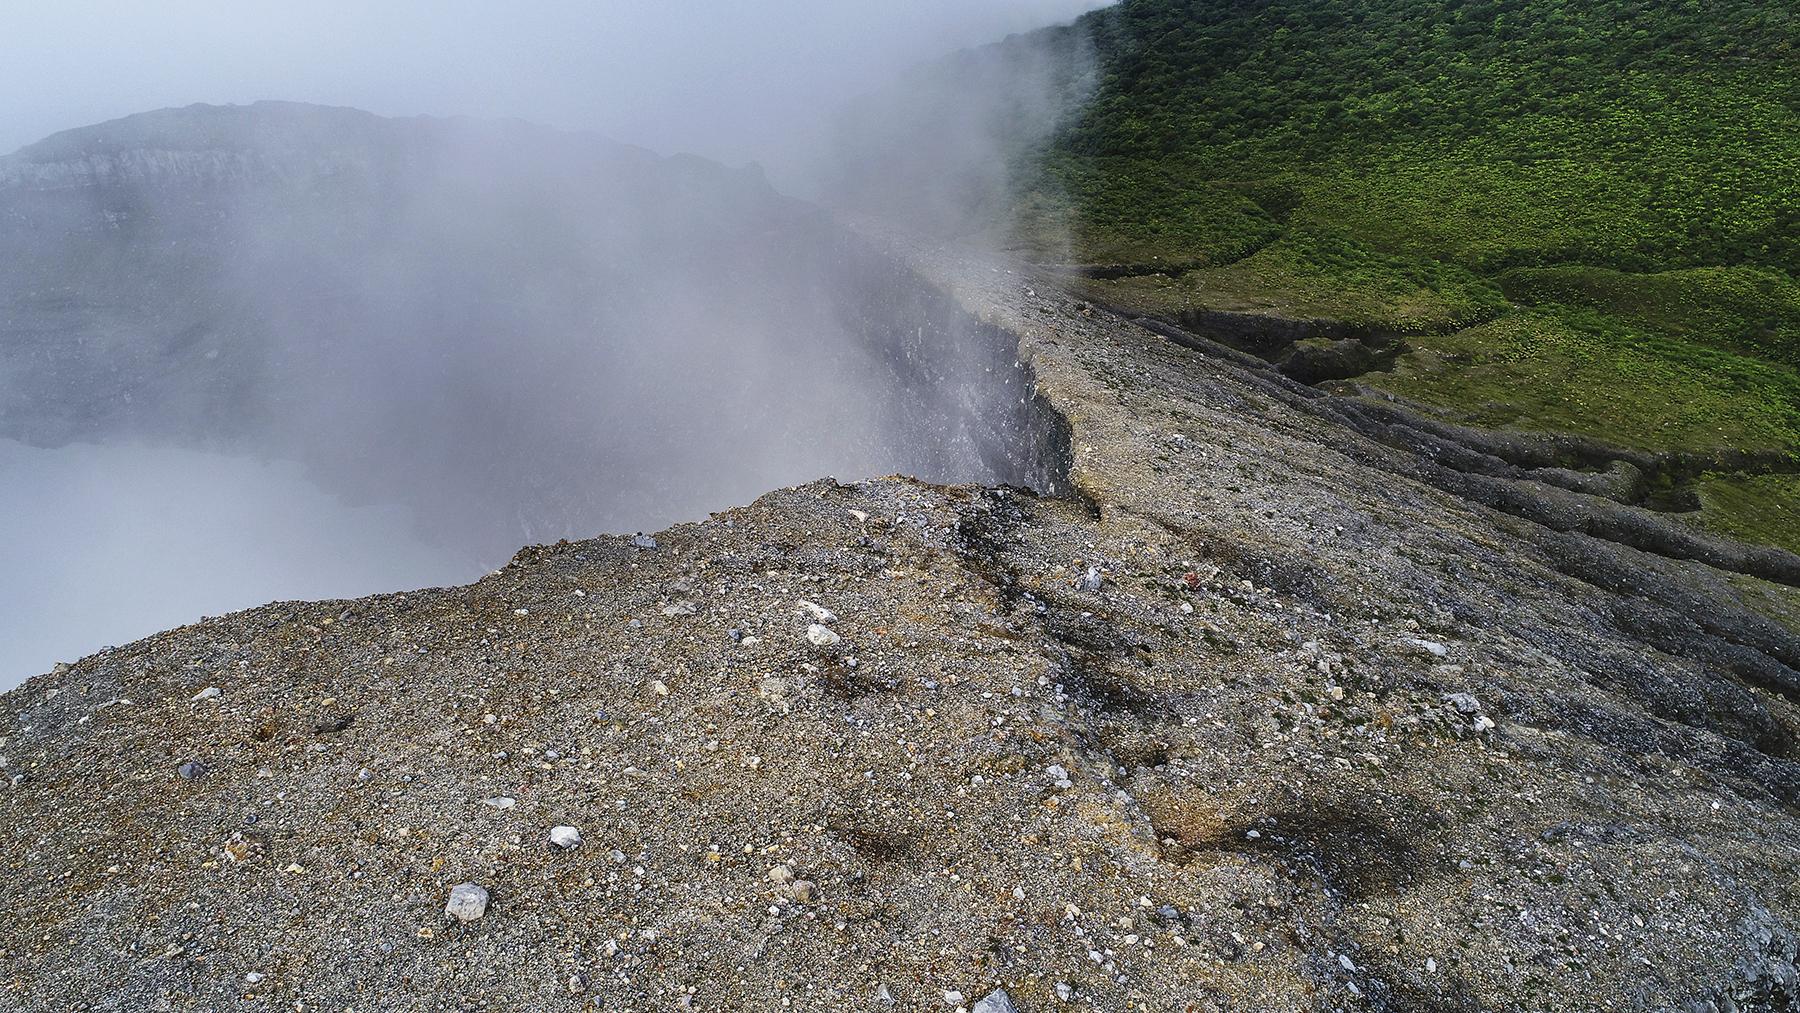 Vista Aerea del crater del Volcán Rincón de la Vieja